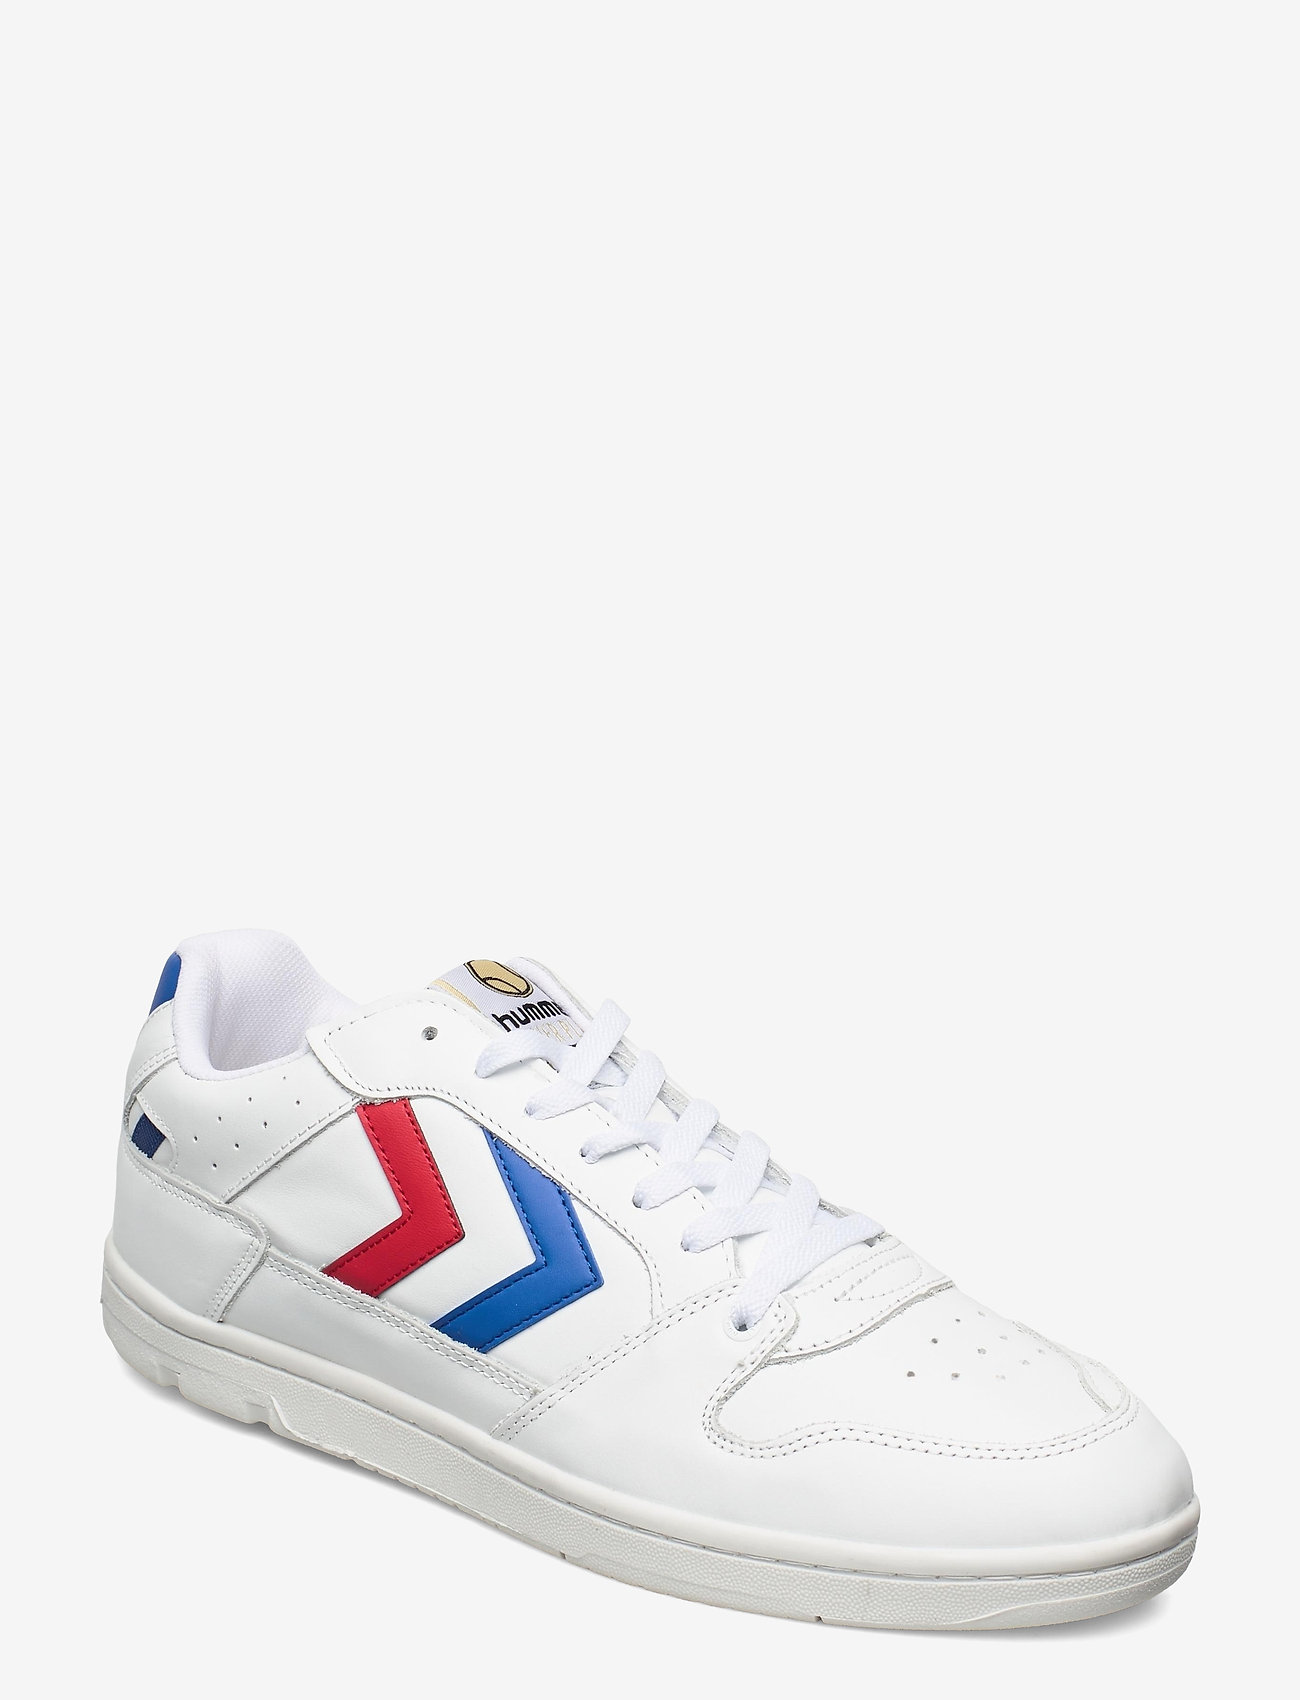 Hummel - POWER PLAY OGC - laag sneakers - white - 1